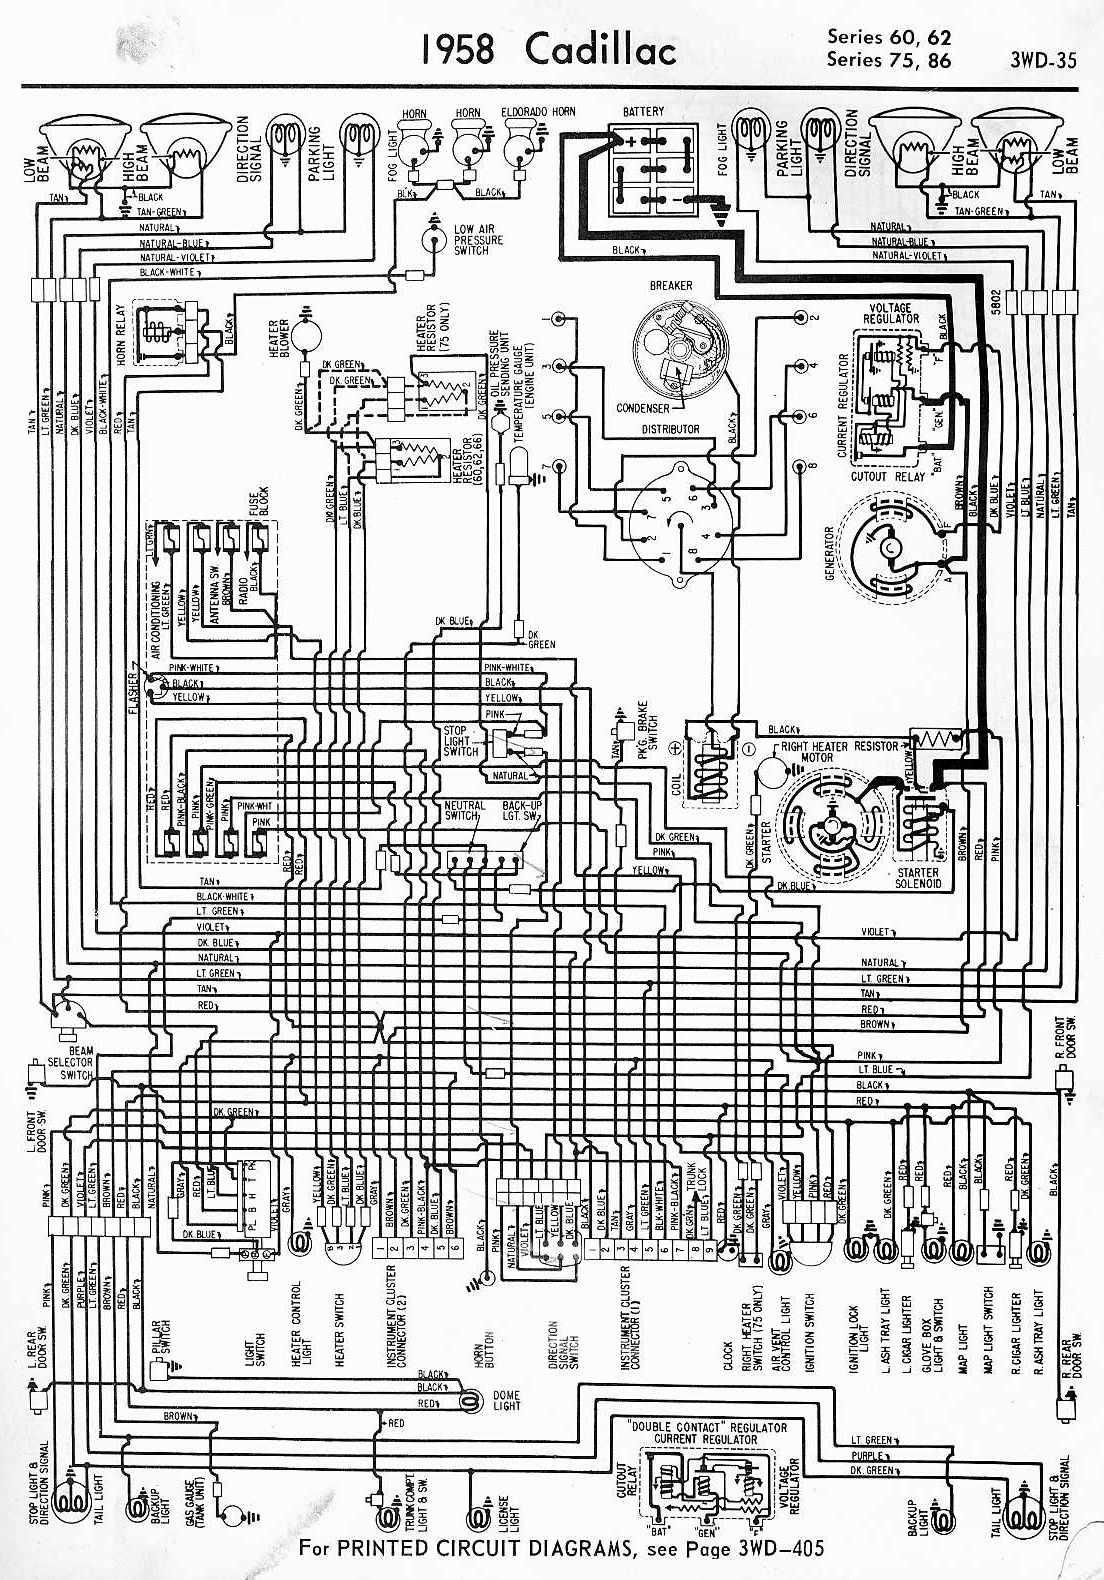 1997 cadillac power seat wiring diagram simple wiring diagramscadillac power seat wiring wiring diagram todays gm [ 1104 x 1580 Pixel ]